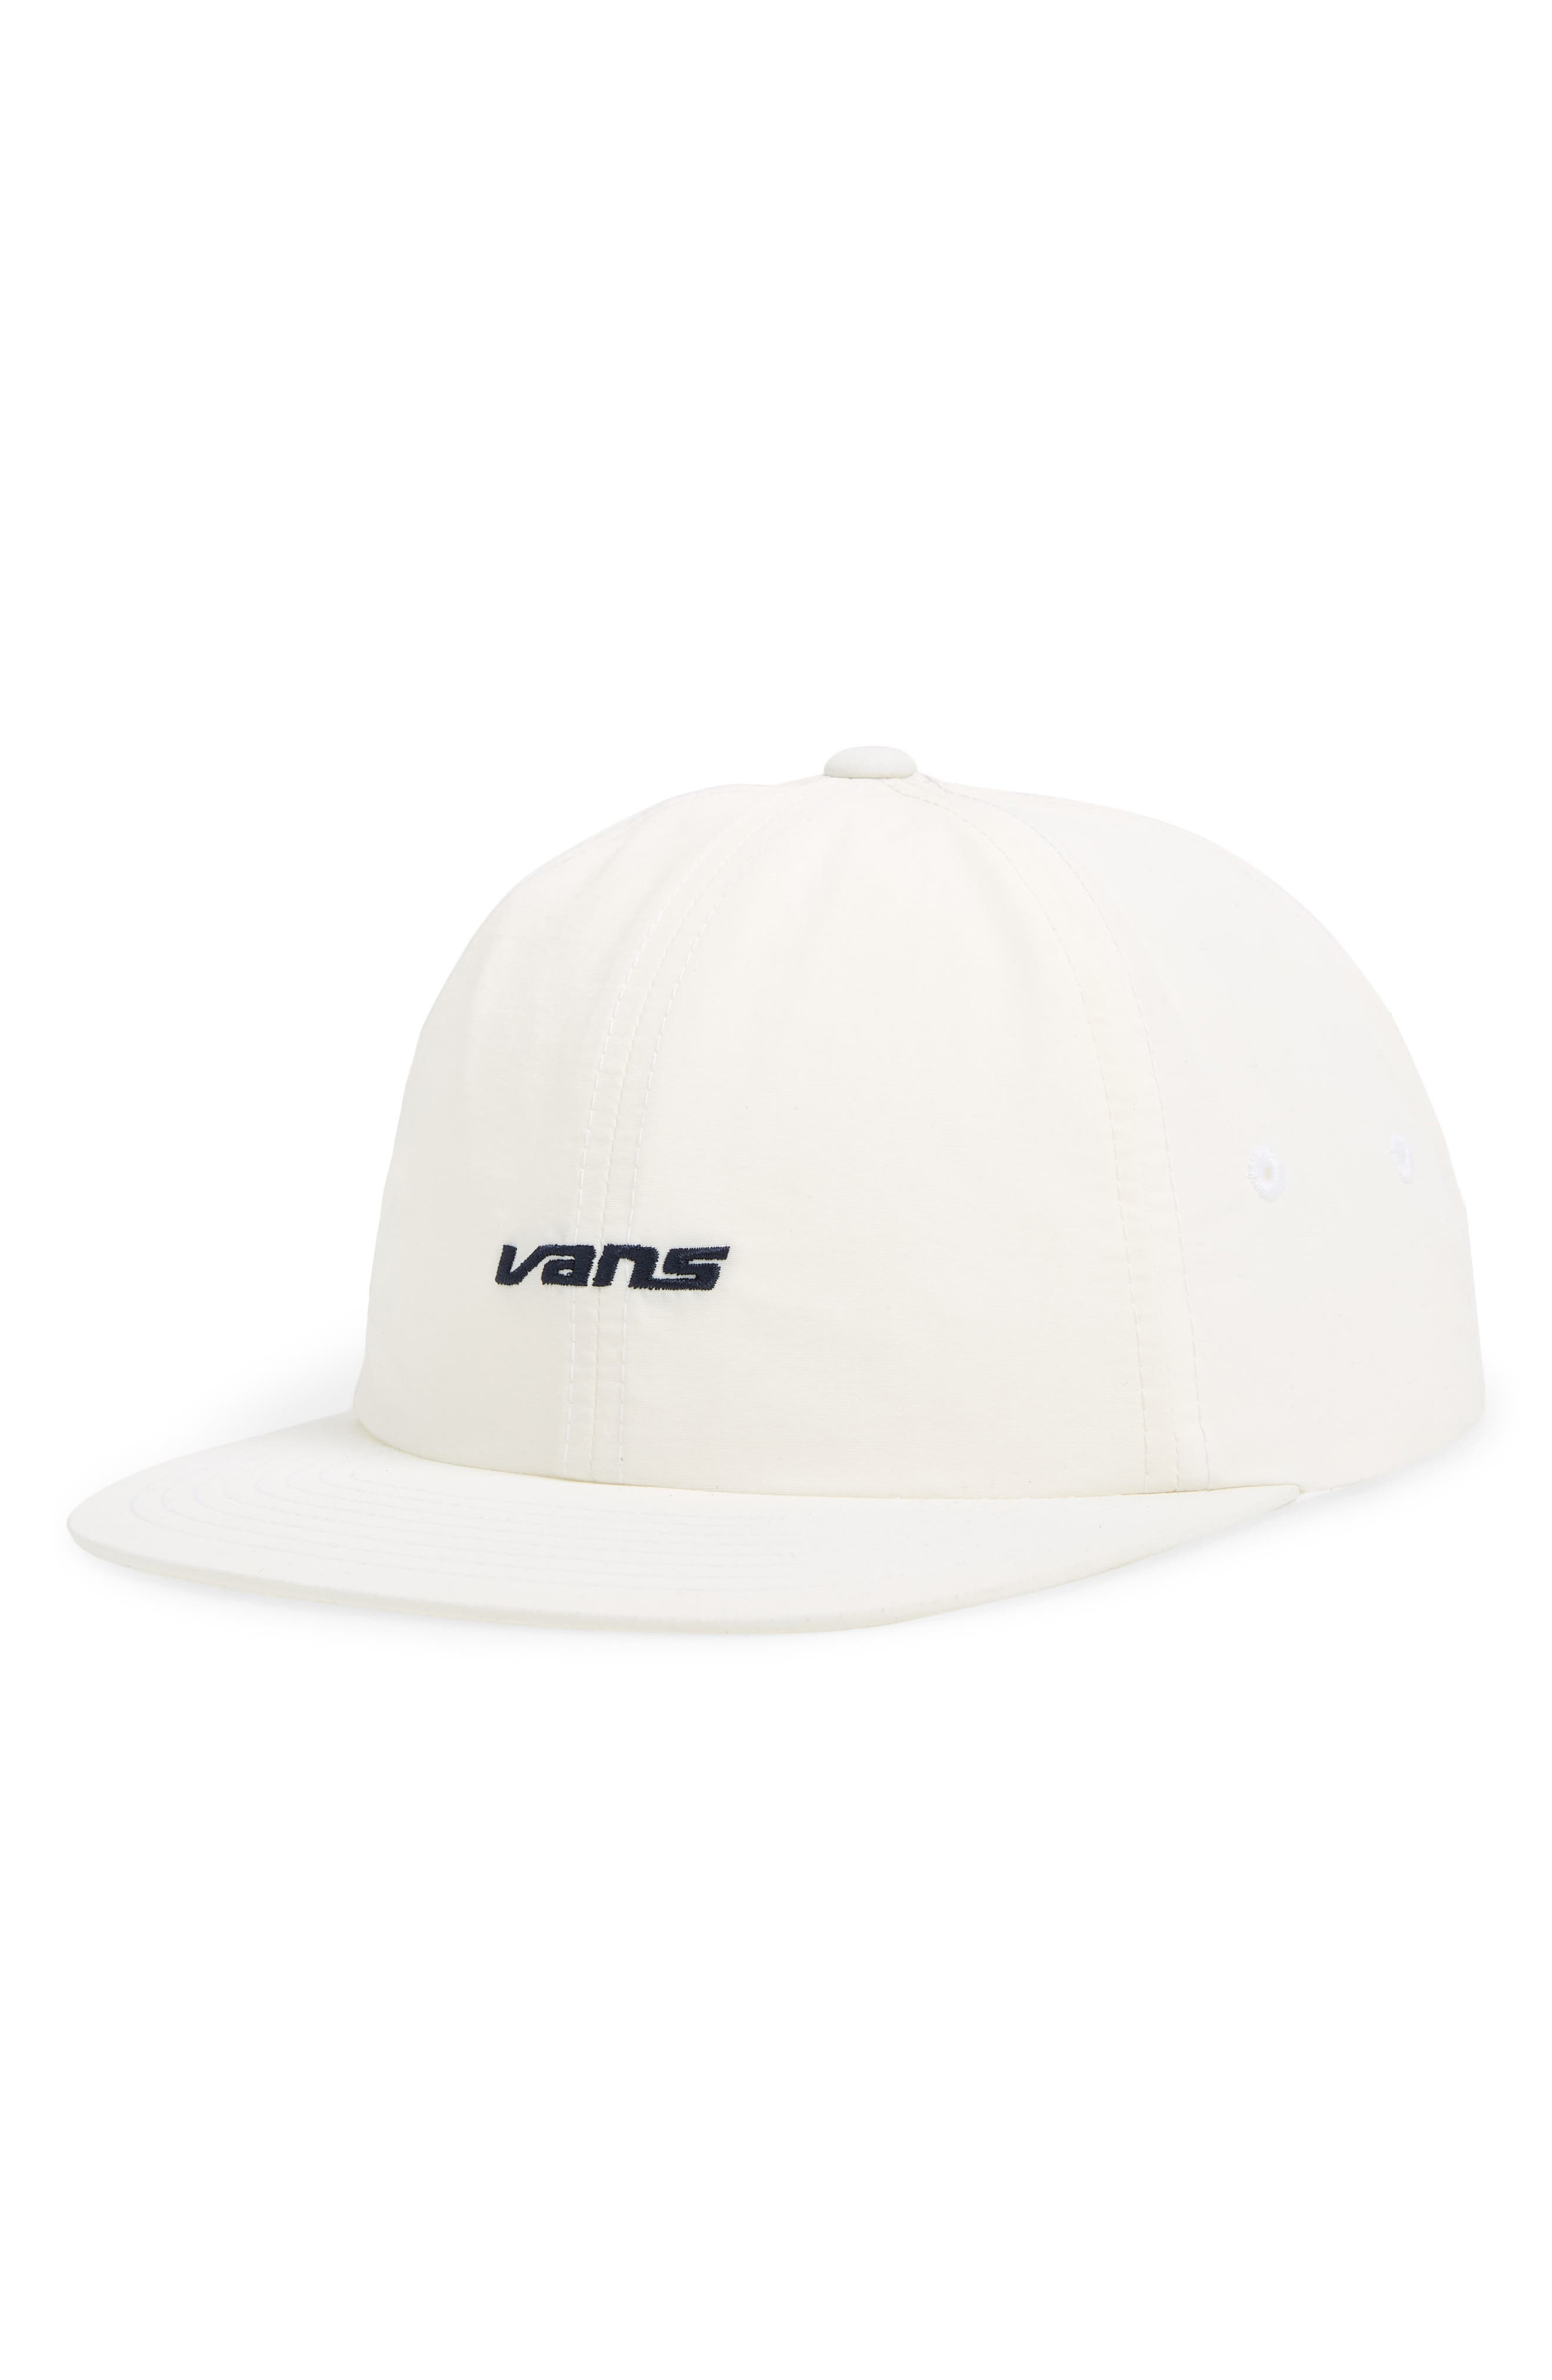 Vans Norvell Jockety Embroidered Baseball Cap